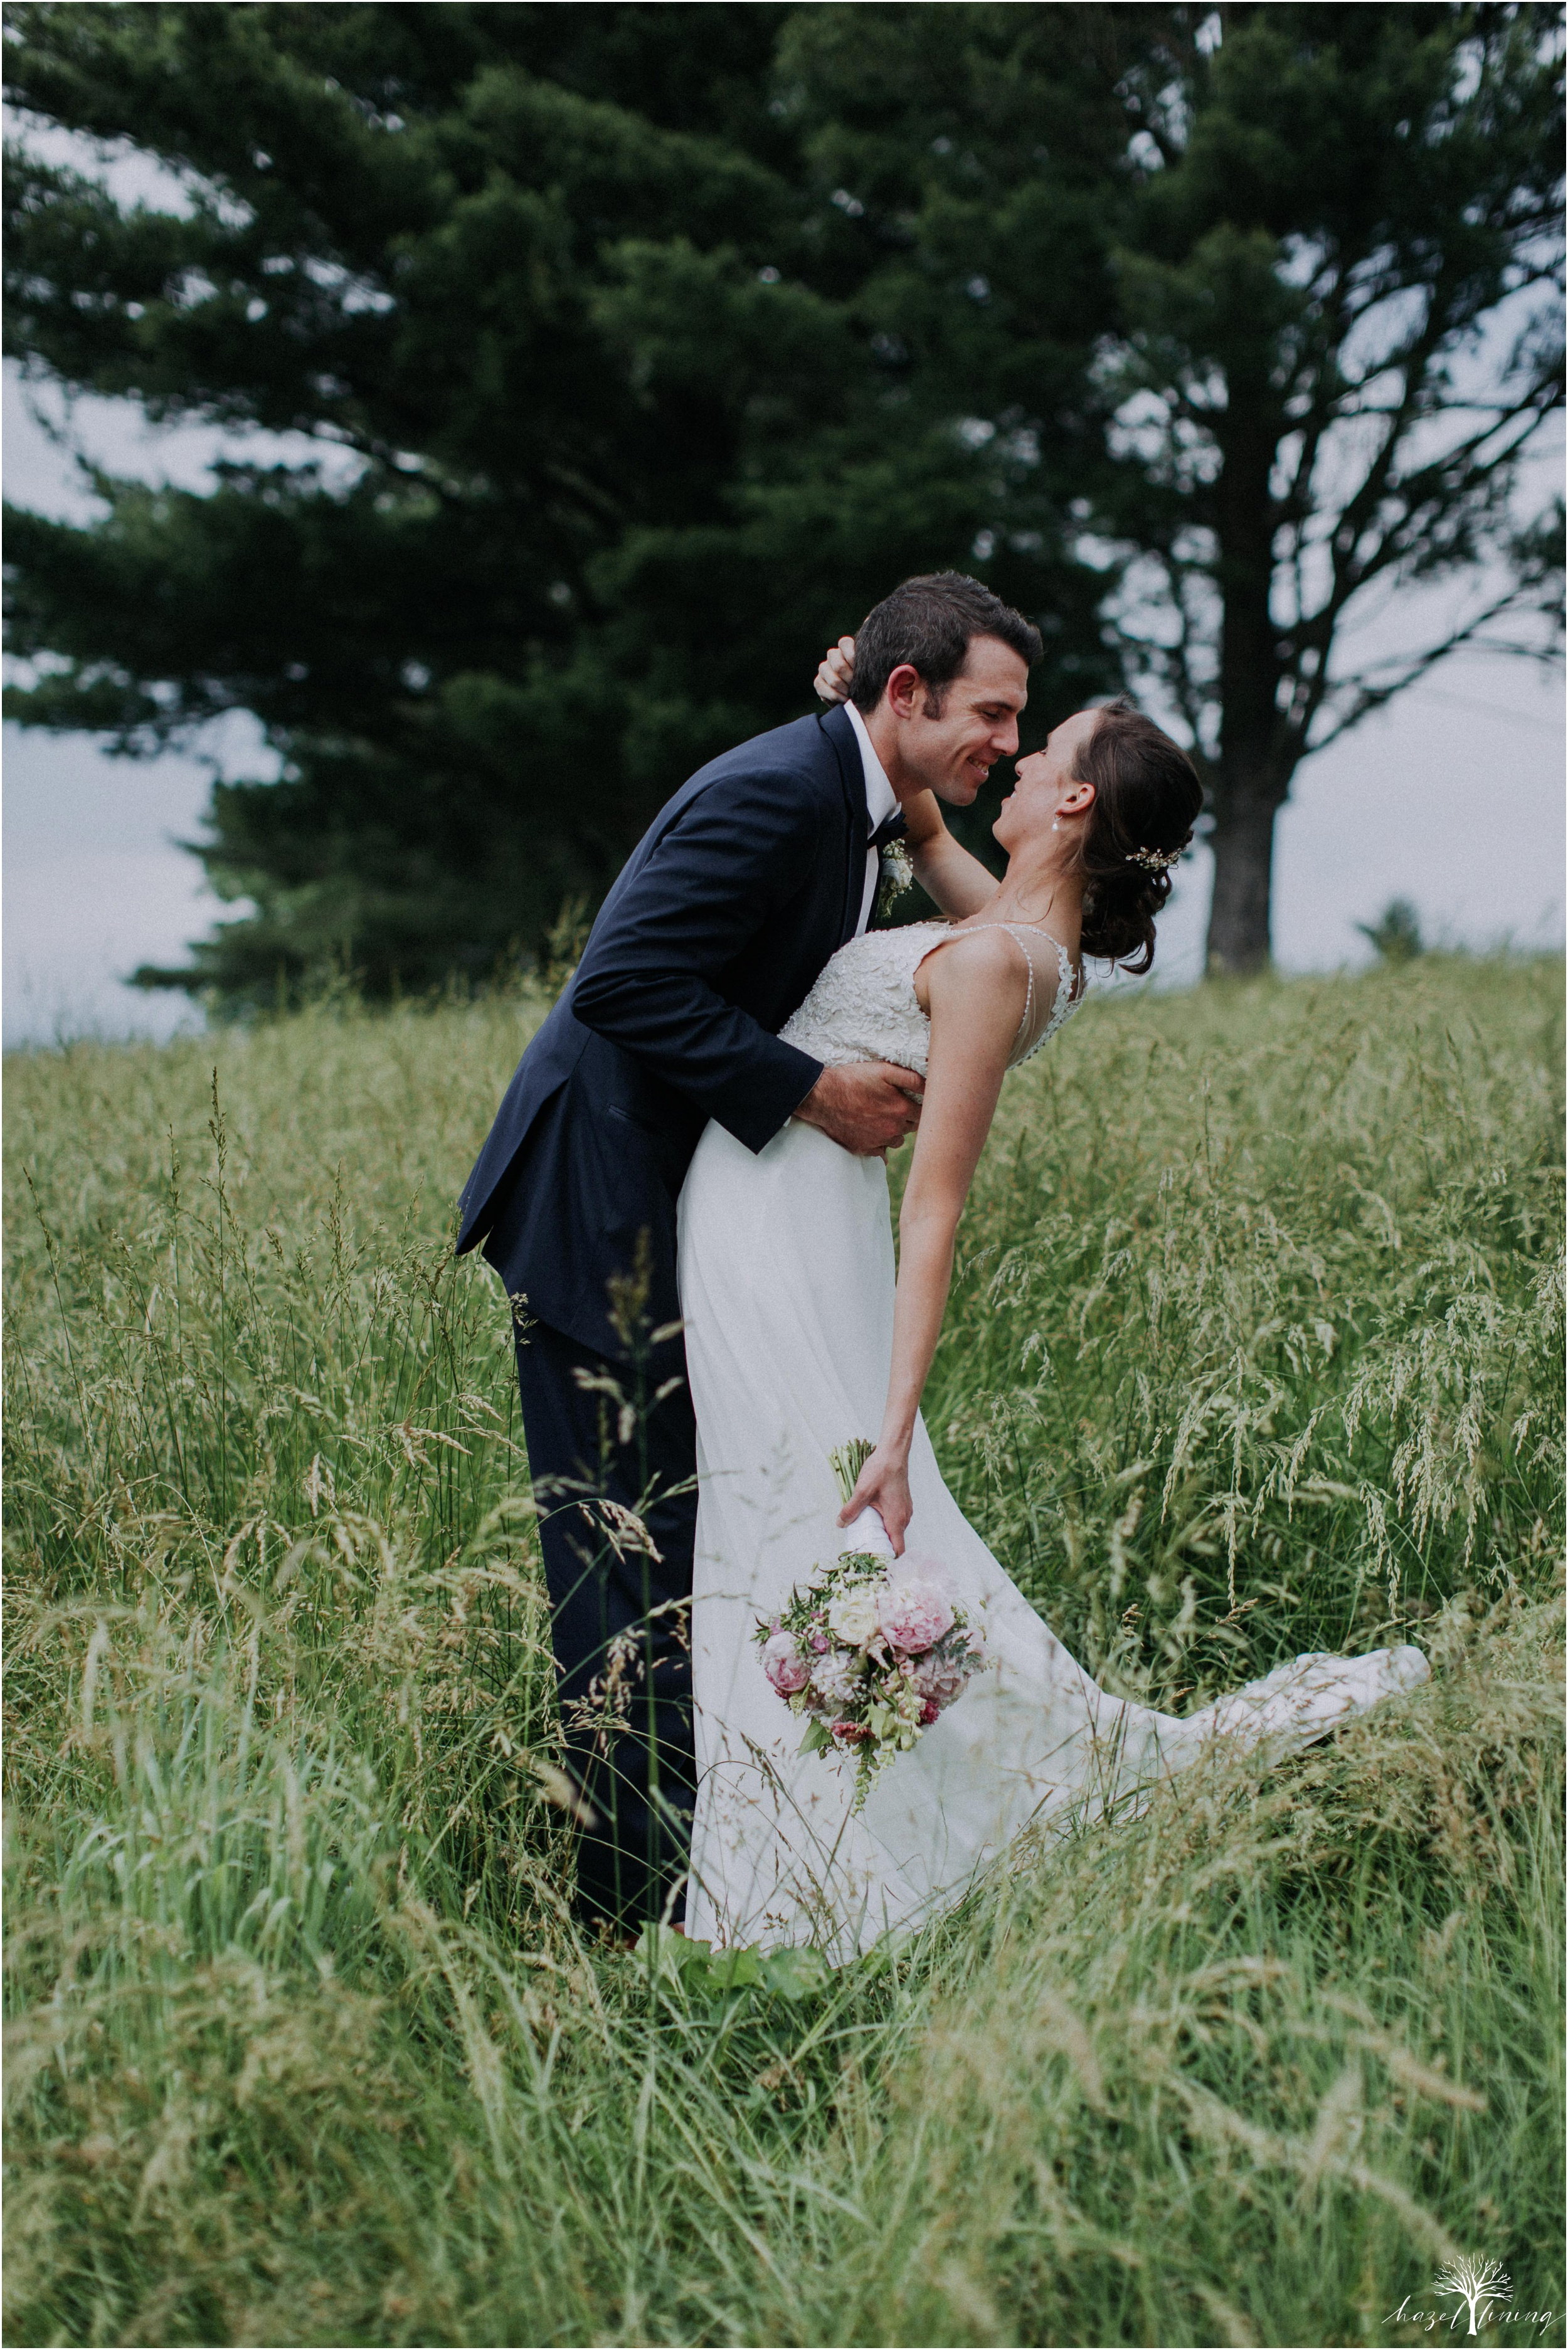 hazel-lining-travel-wedding-elopement-photography_0104.jpg